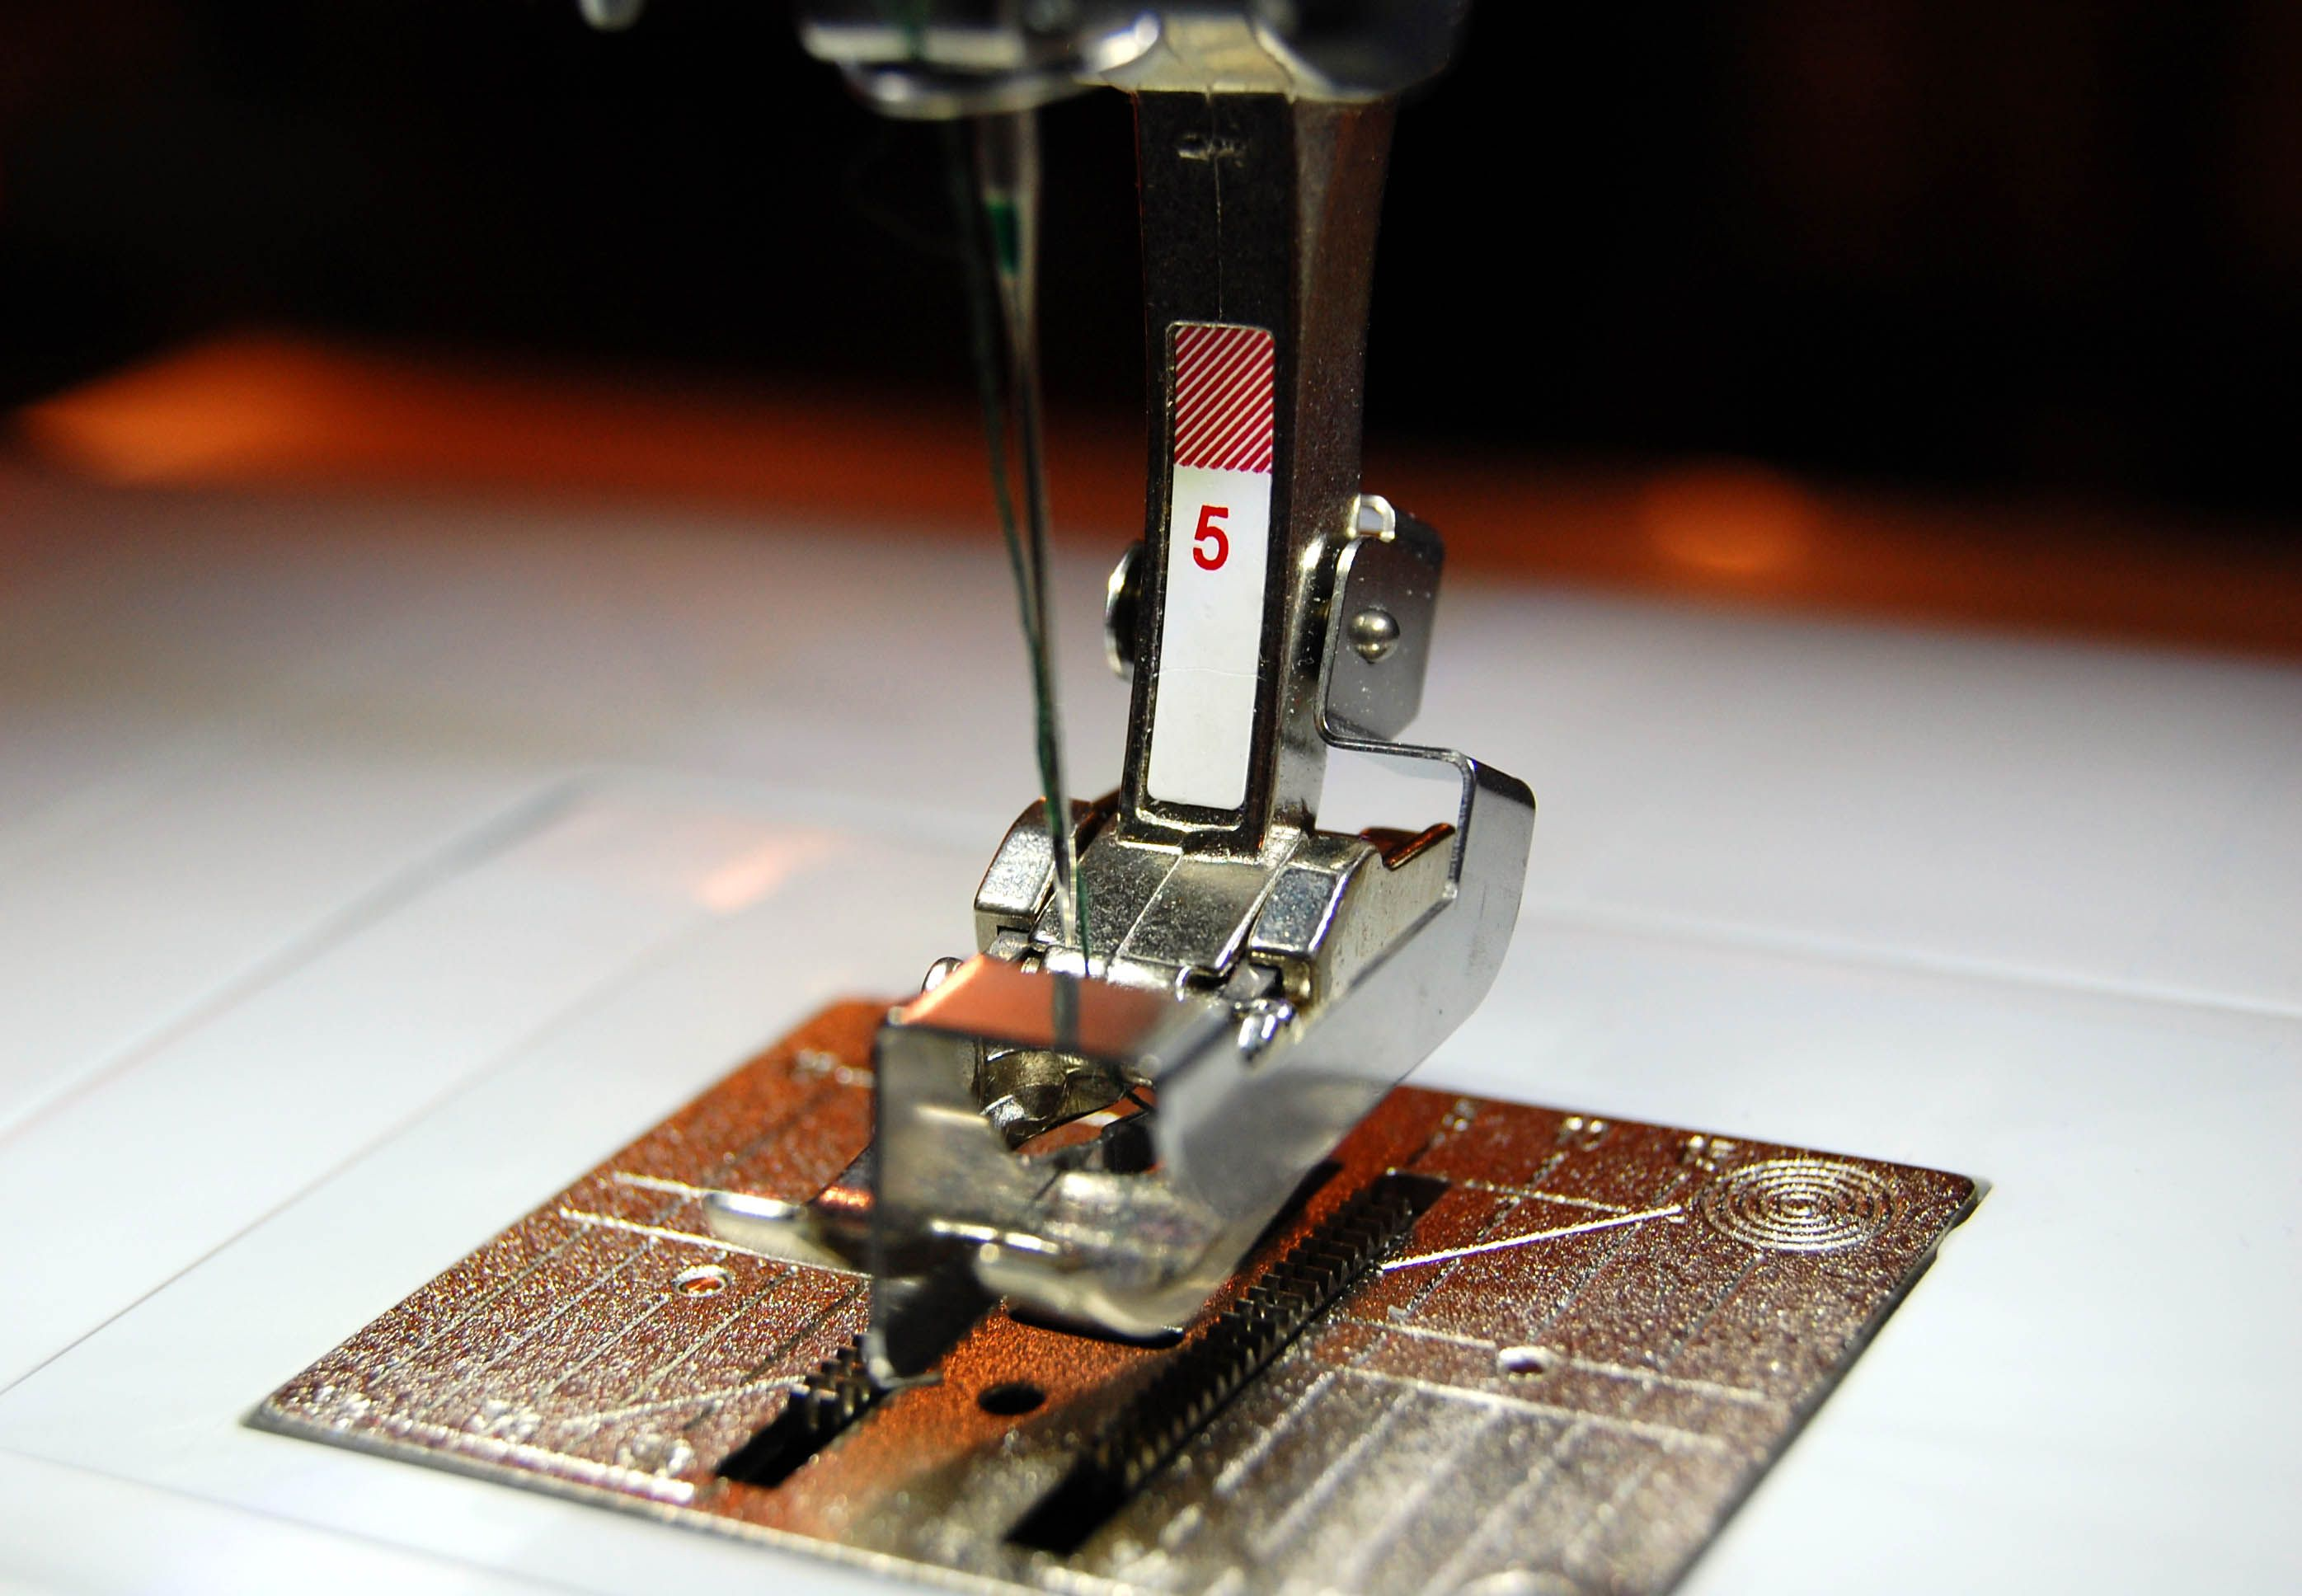 Sew A Blind Hem With Blindstitch Foot 5 I M Crafty